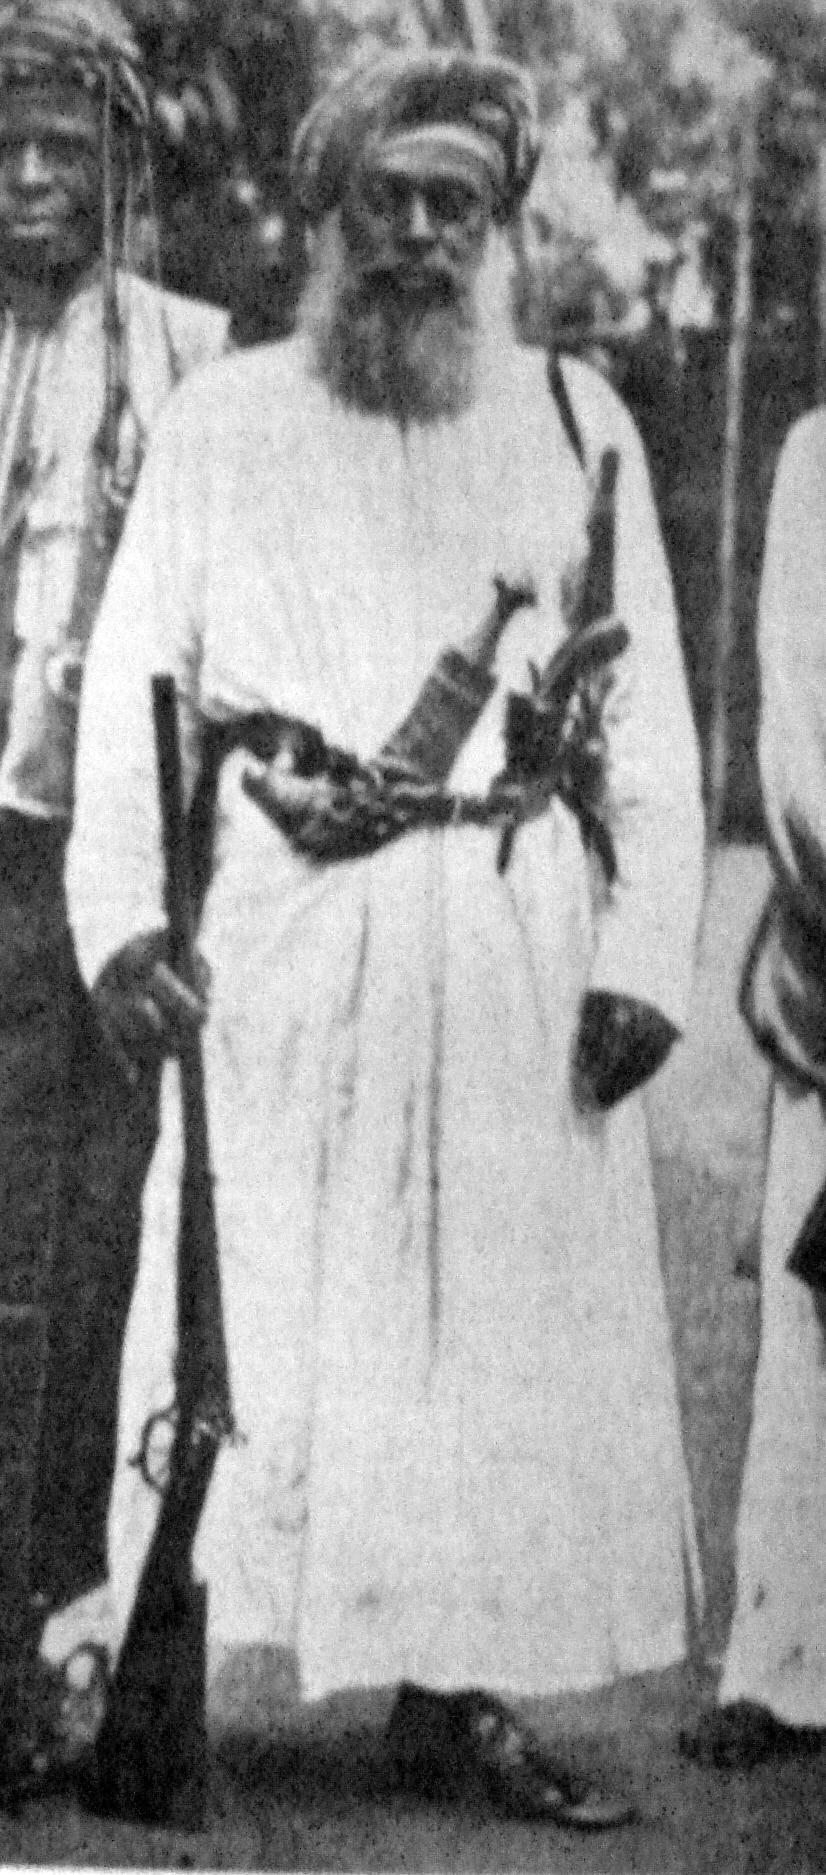 Al Bashir ibn Salim al-Harthi also known by the name Abushiri